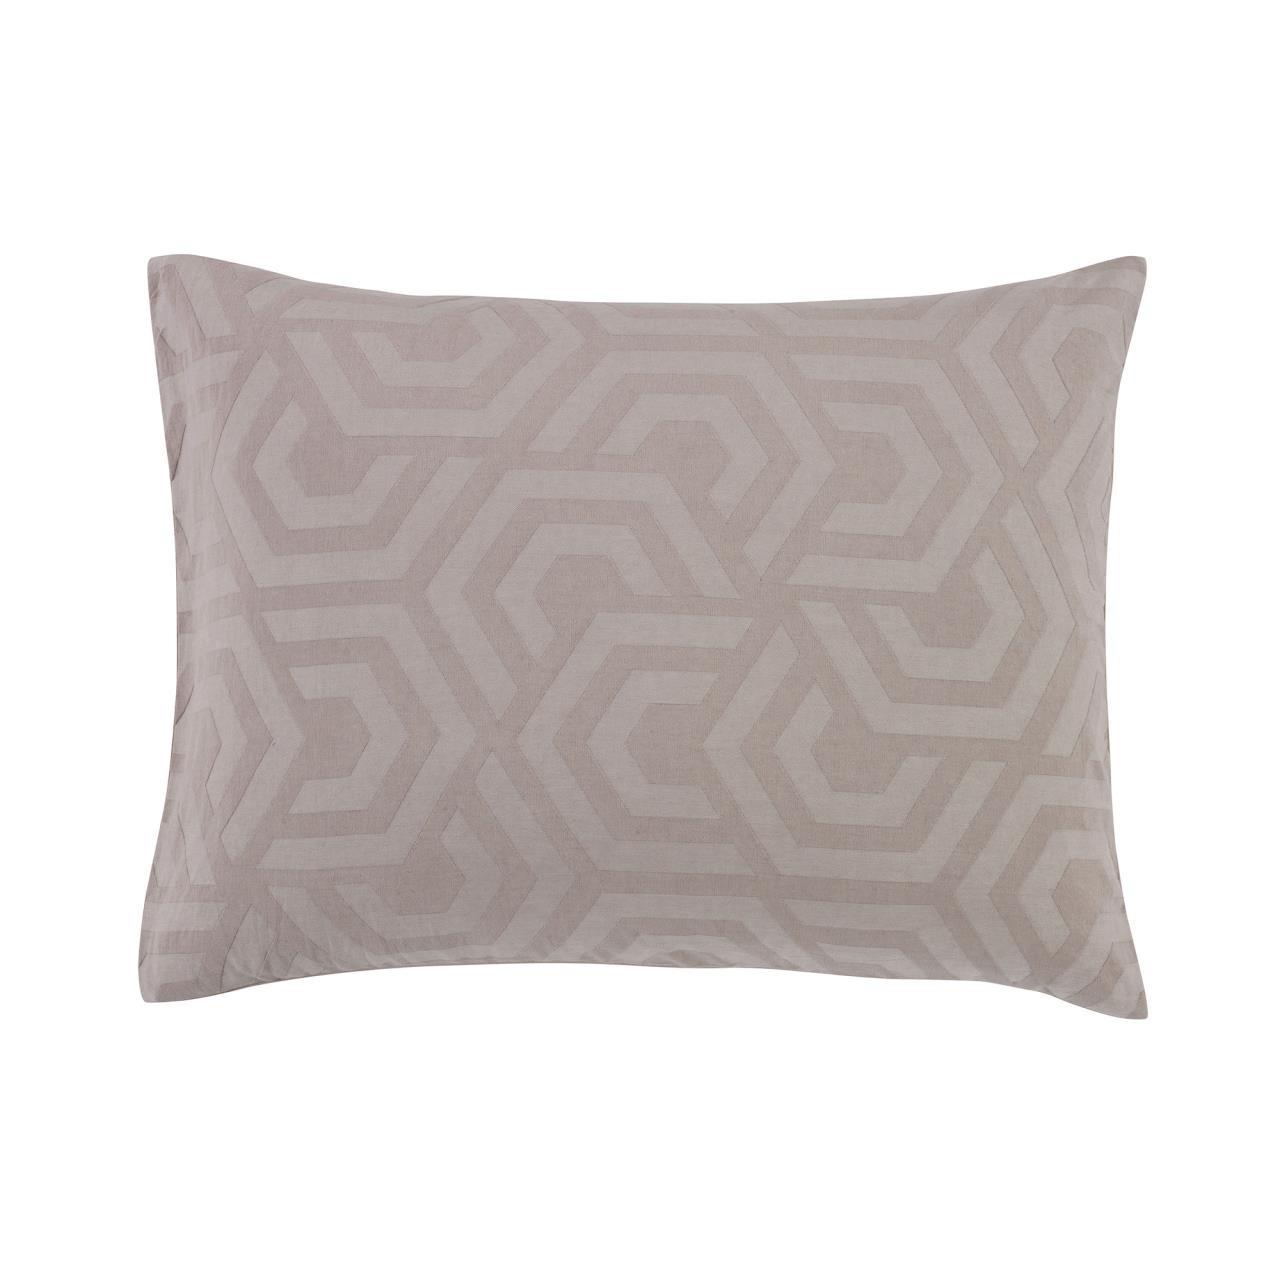 Seville Blush Comforter Set - 754069006670